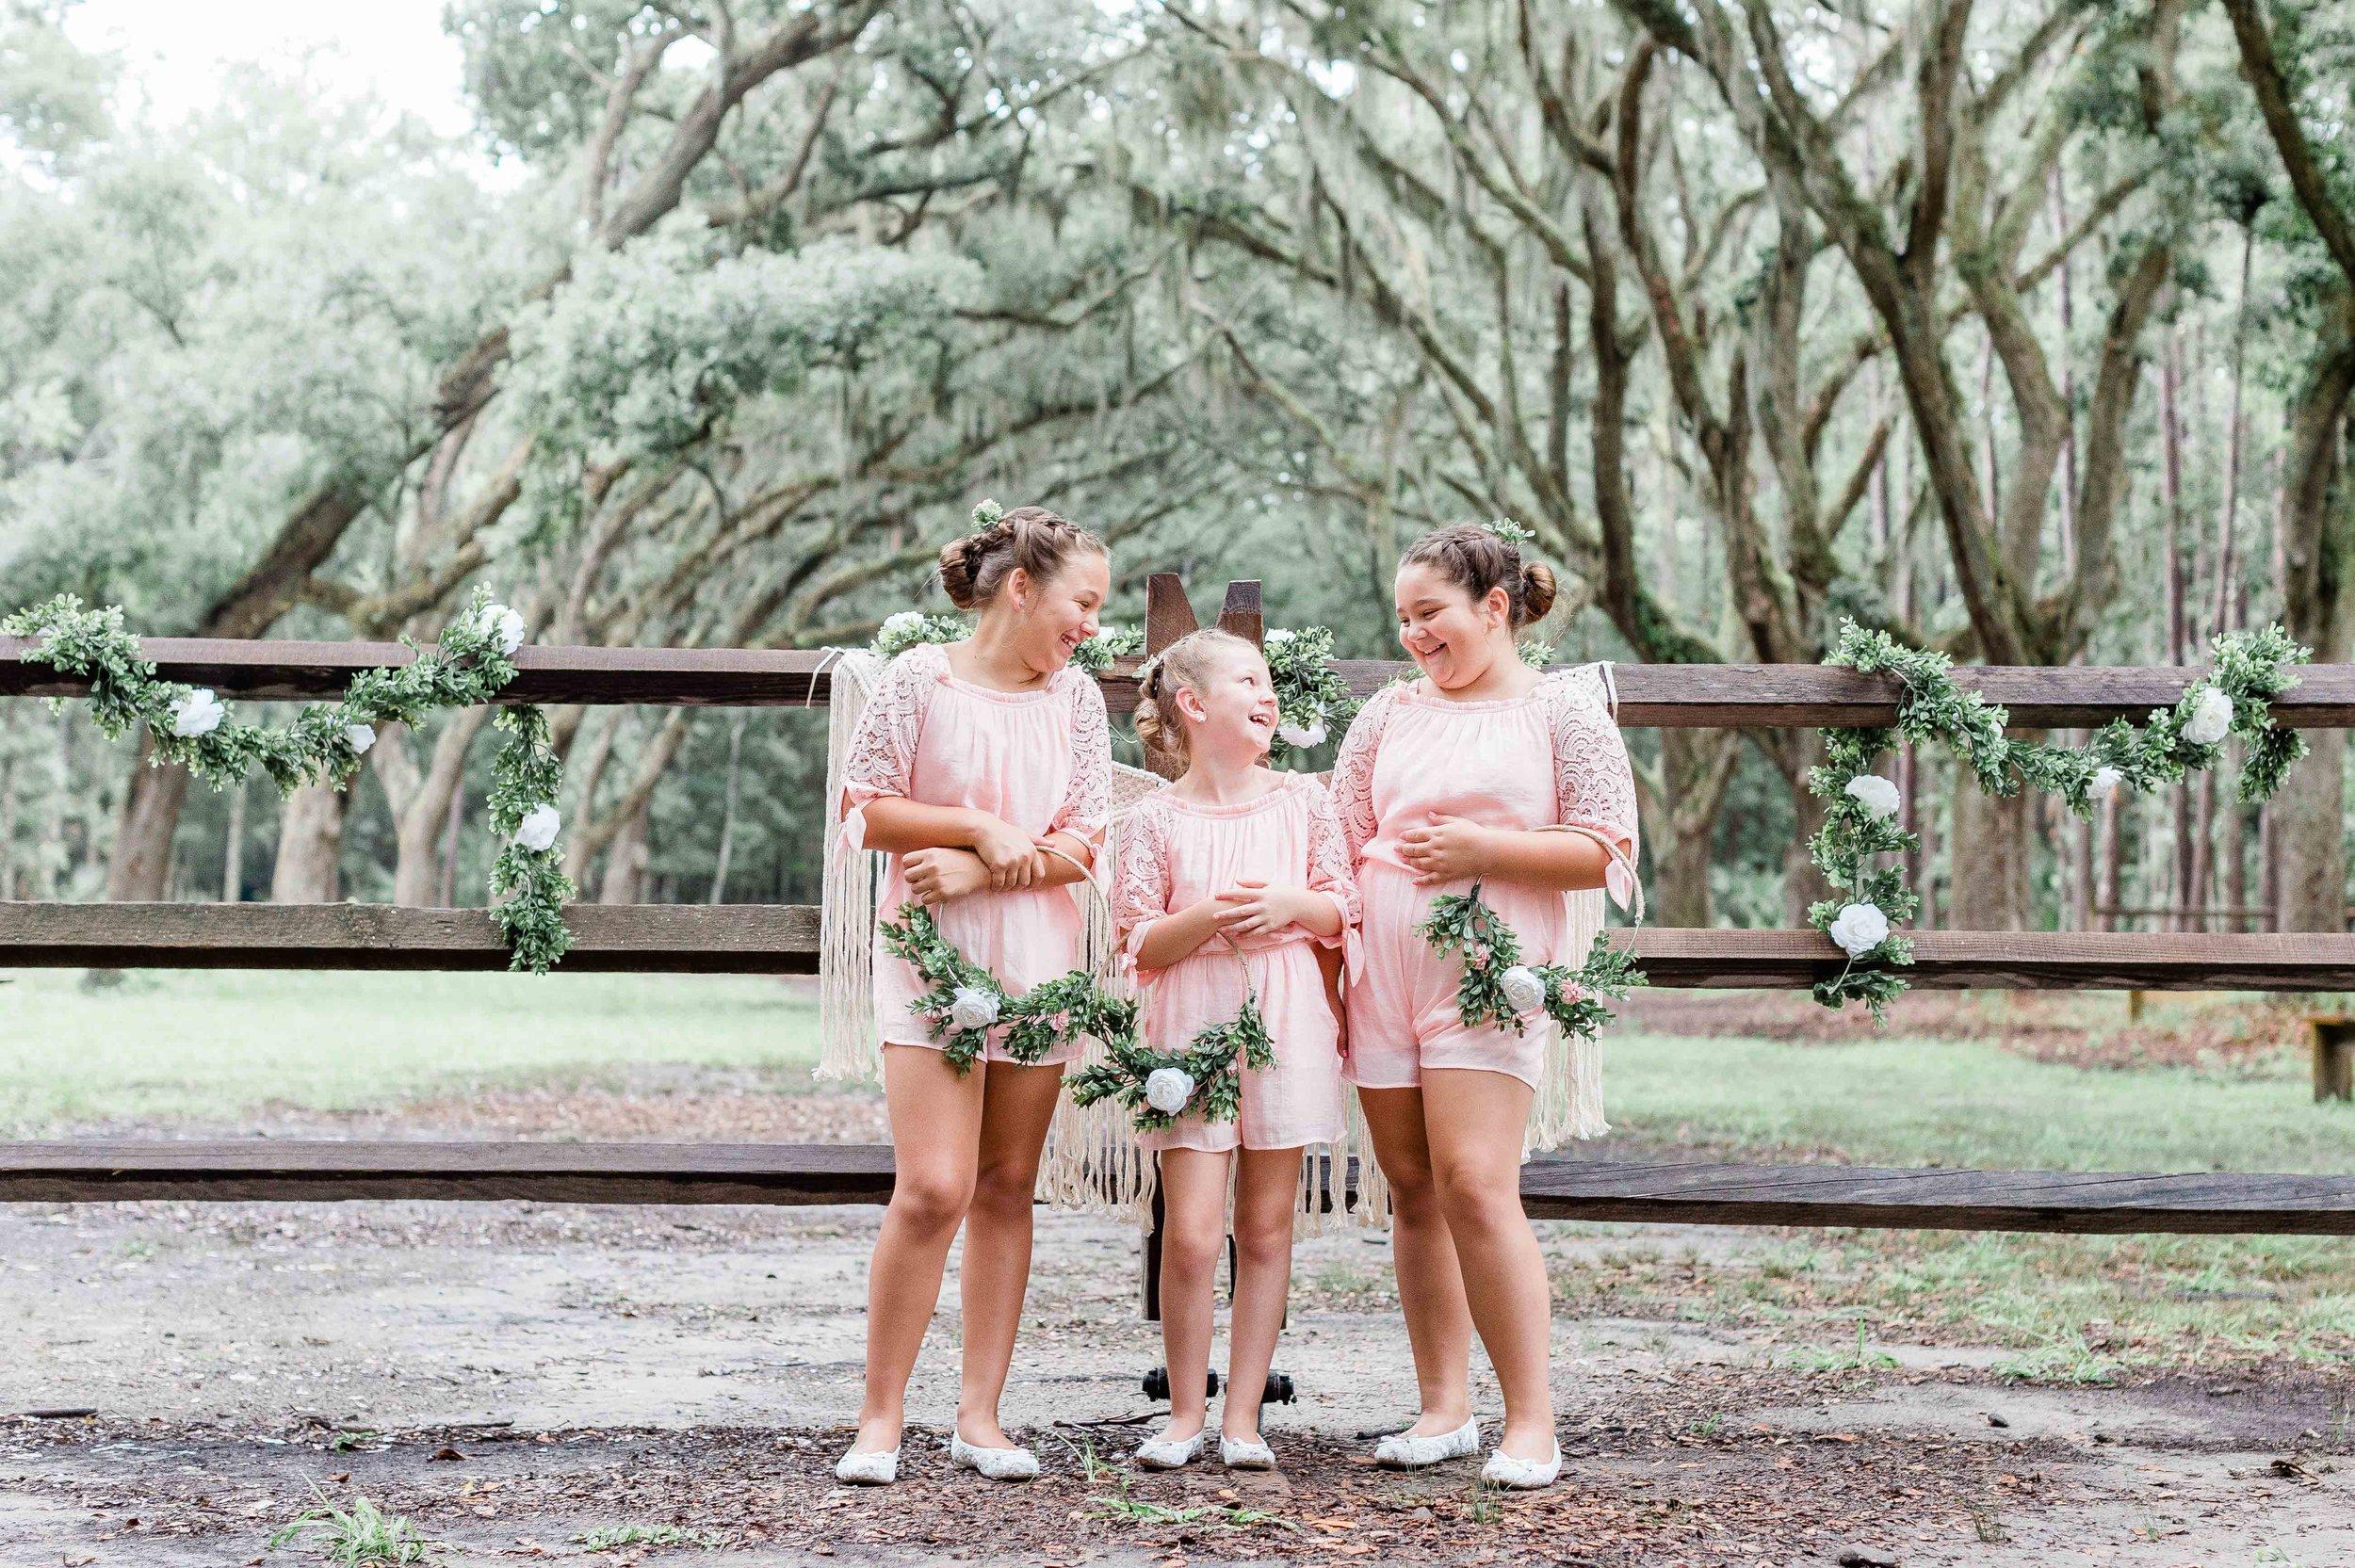 20190727Georgia-Wormlsoe Plantation-Simply Eloped-Savannah Wedding Photographer- Southern Lens Photography07.jpg